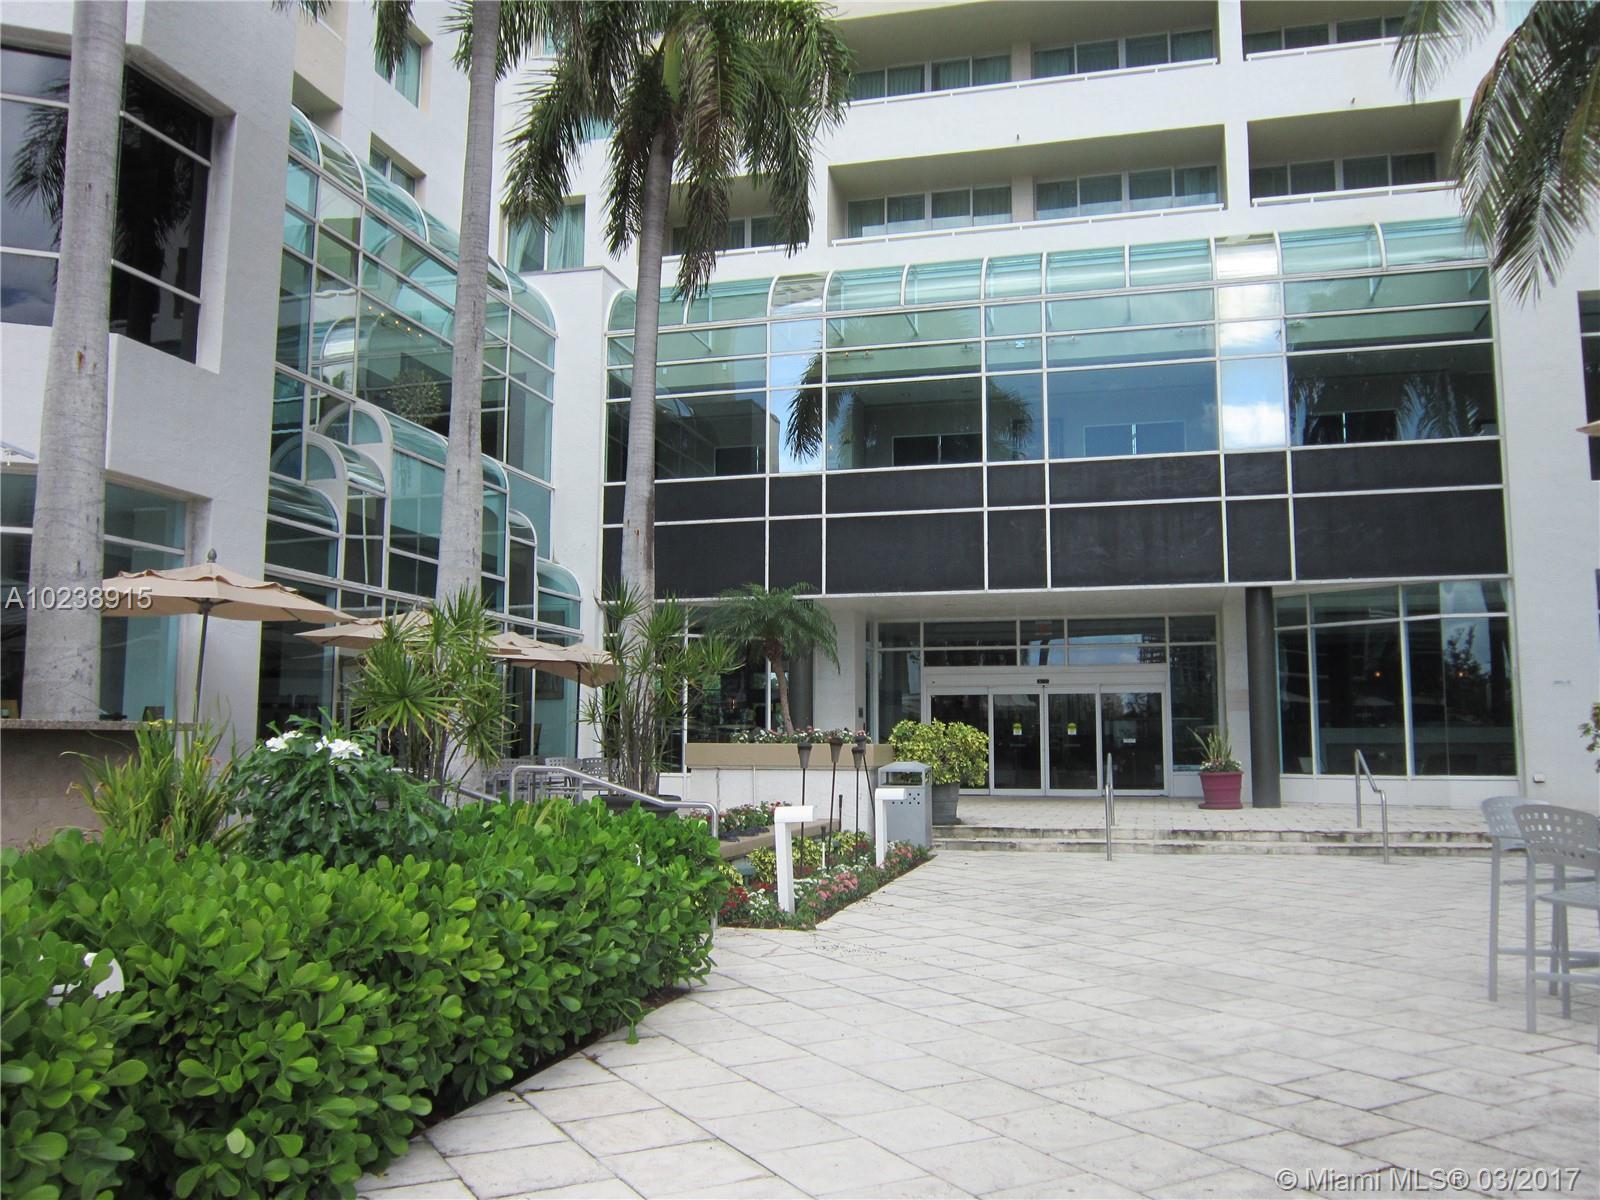 Condo Building Code Fort Lauderdale